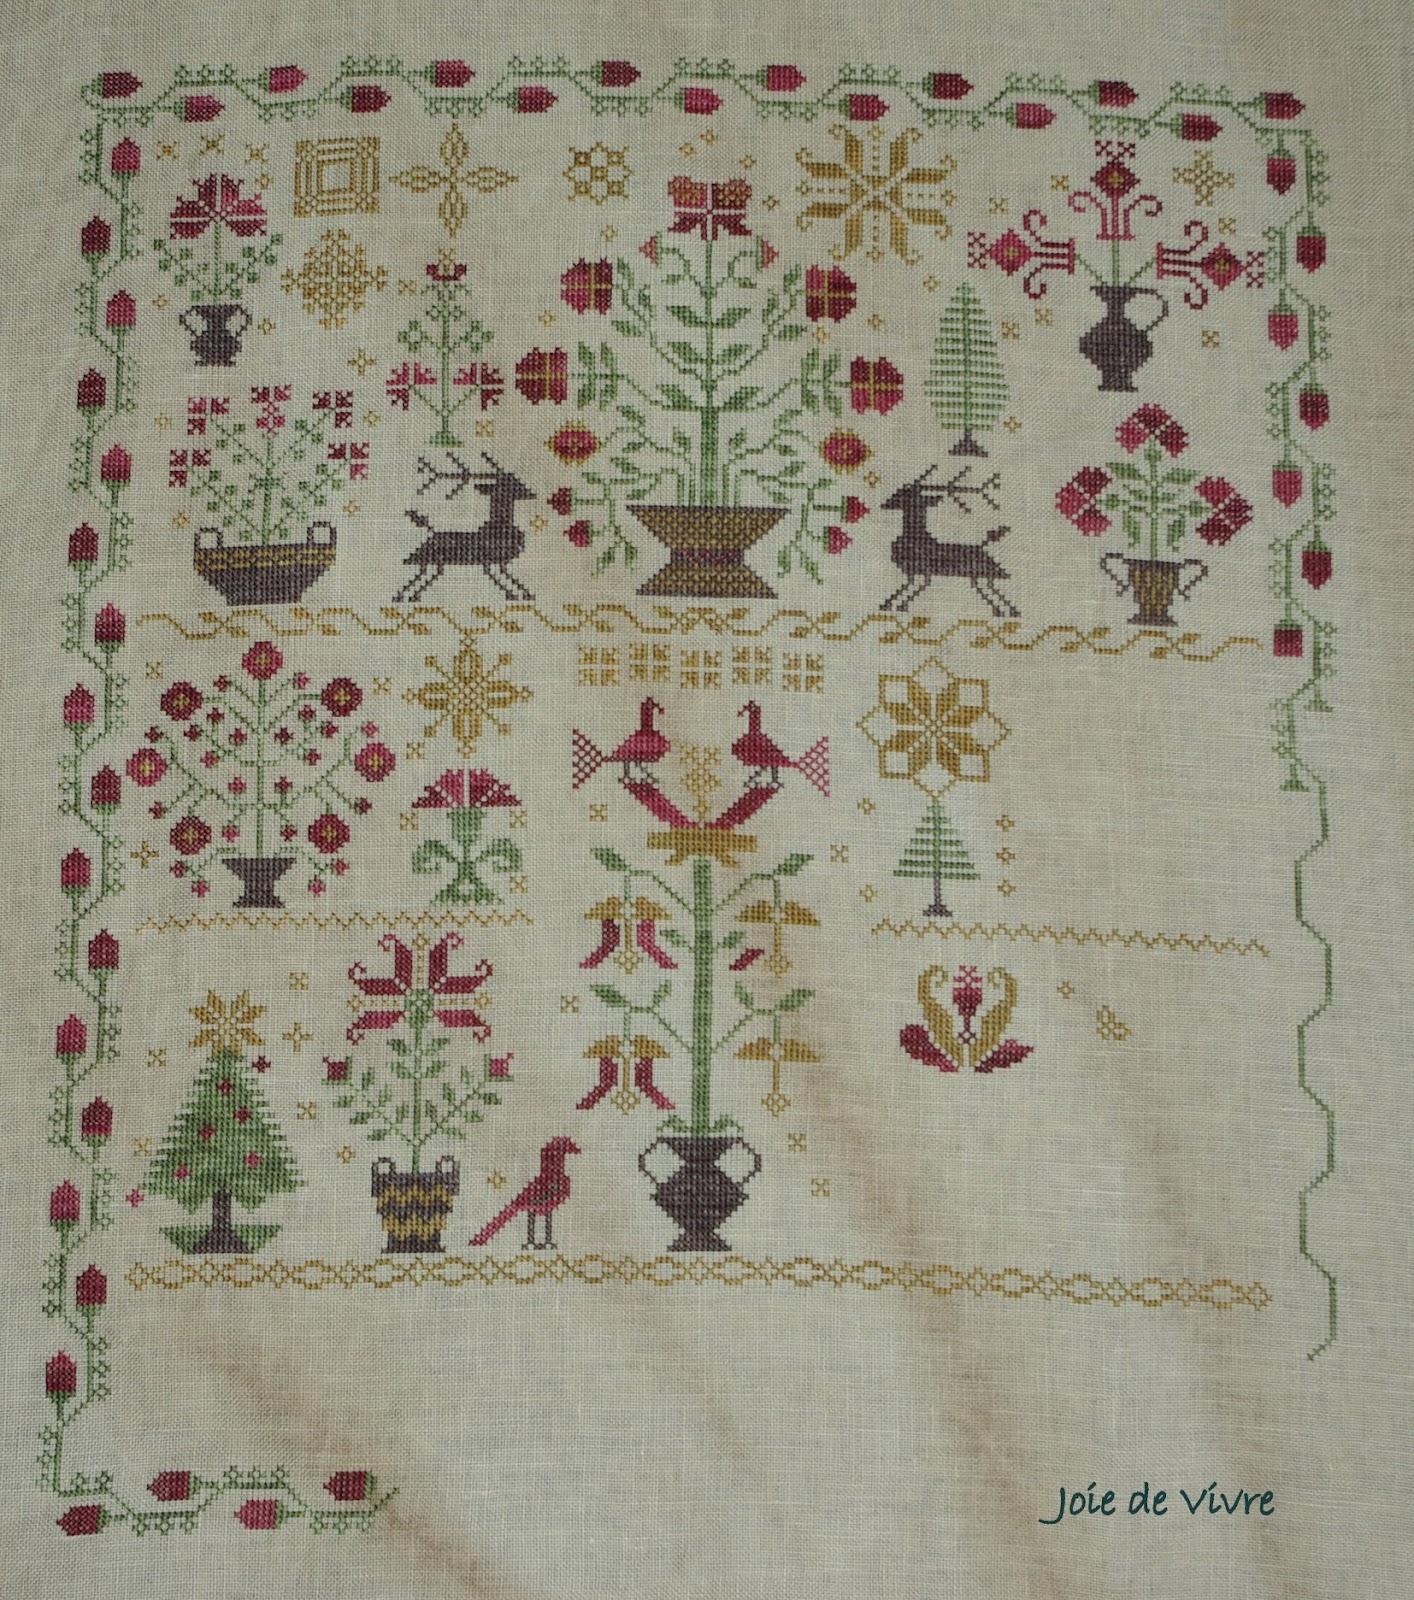 Joie de vivre olympic stitching recap for Christmas garden blackbird designs